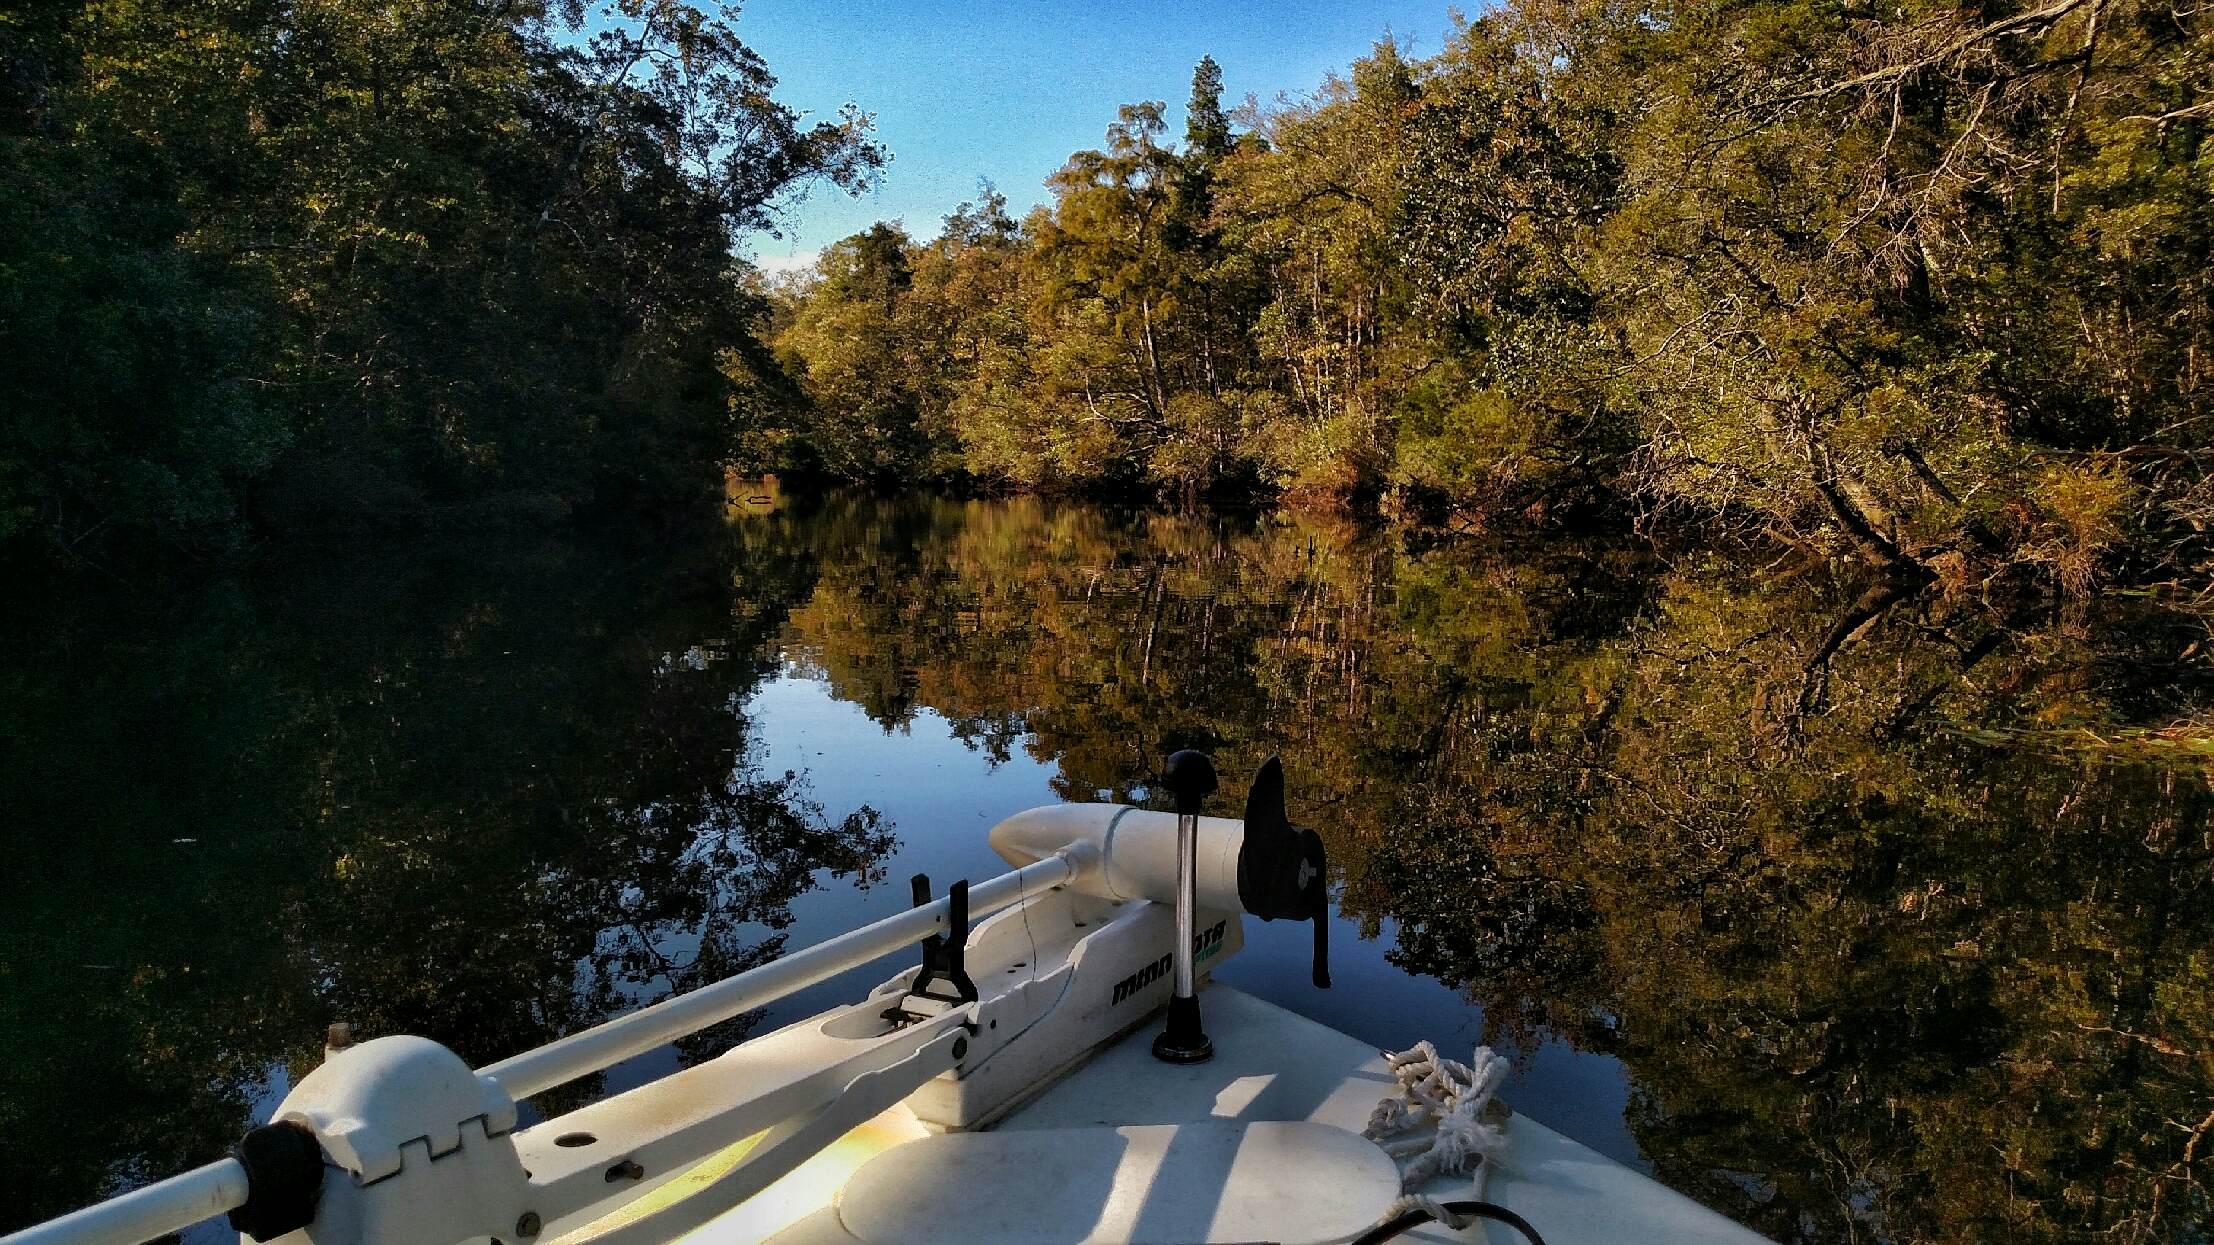 florida, nature, landscape, birding